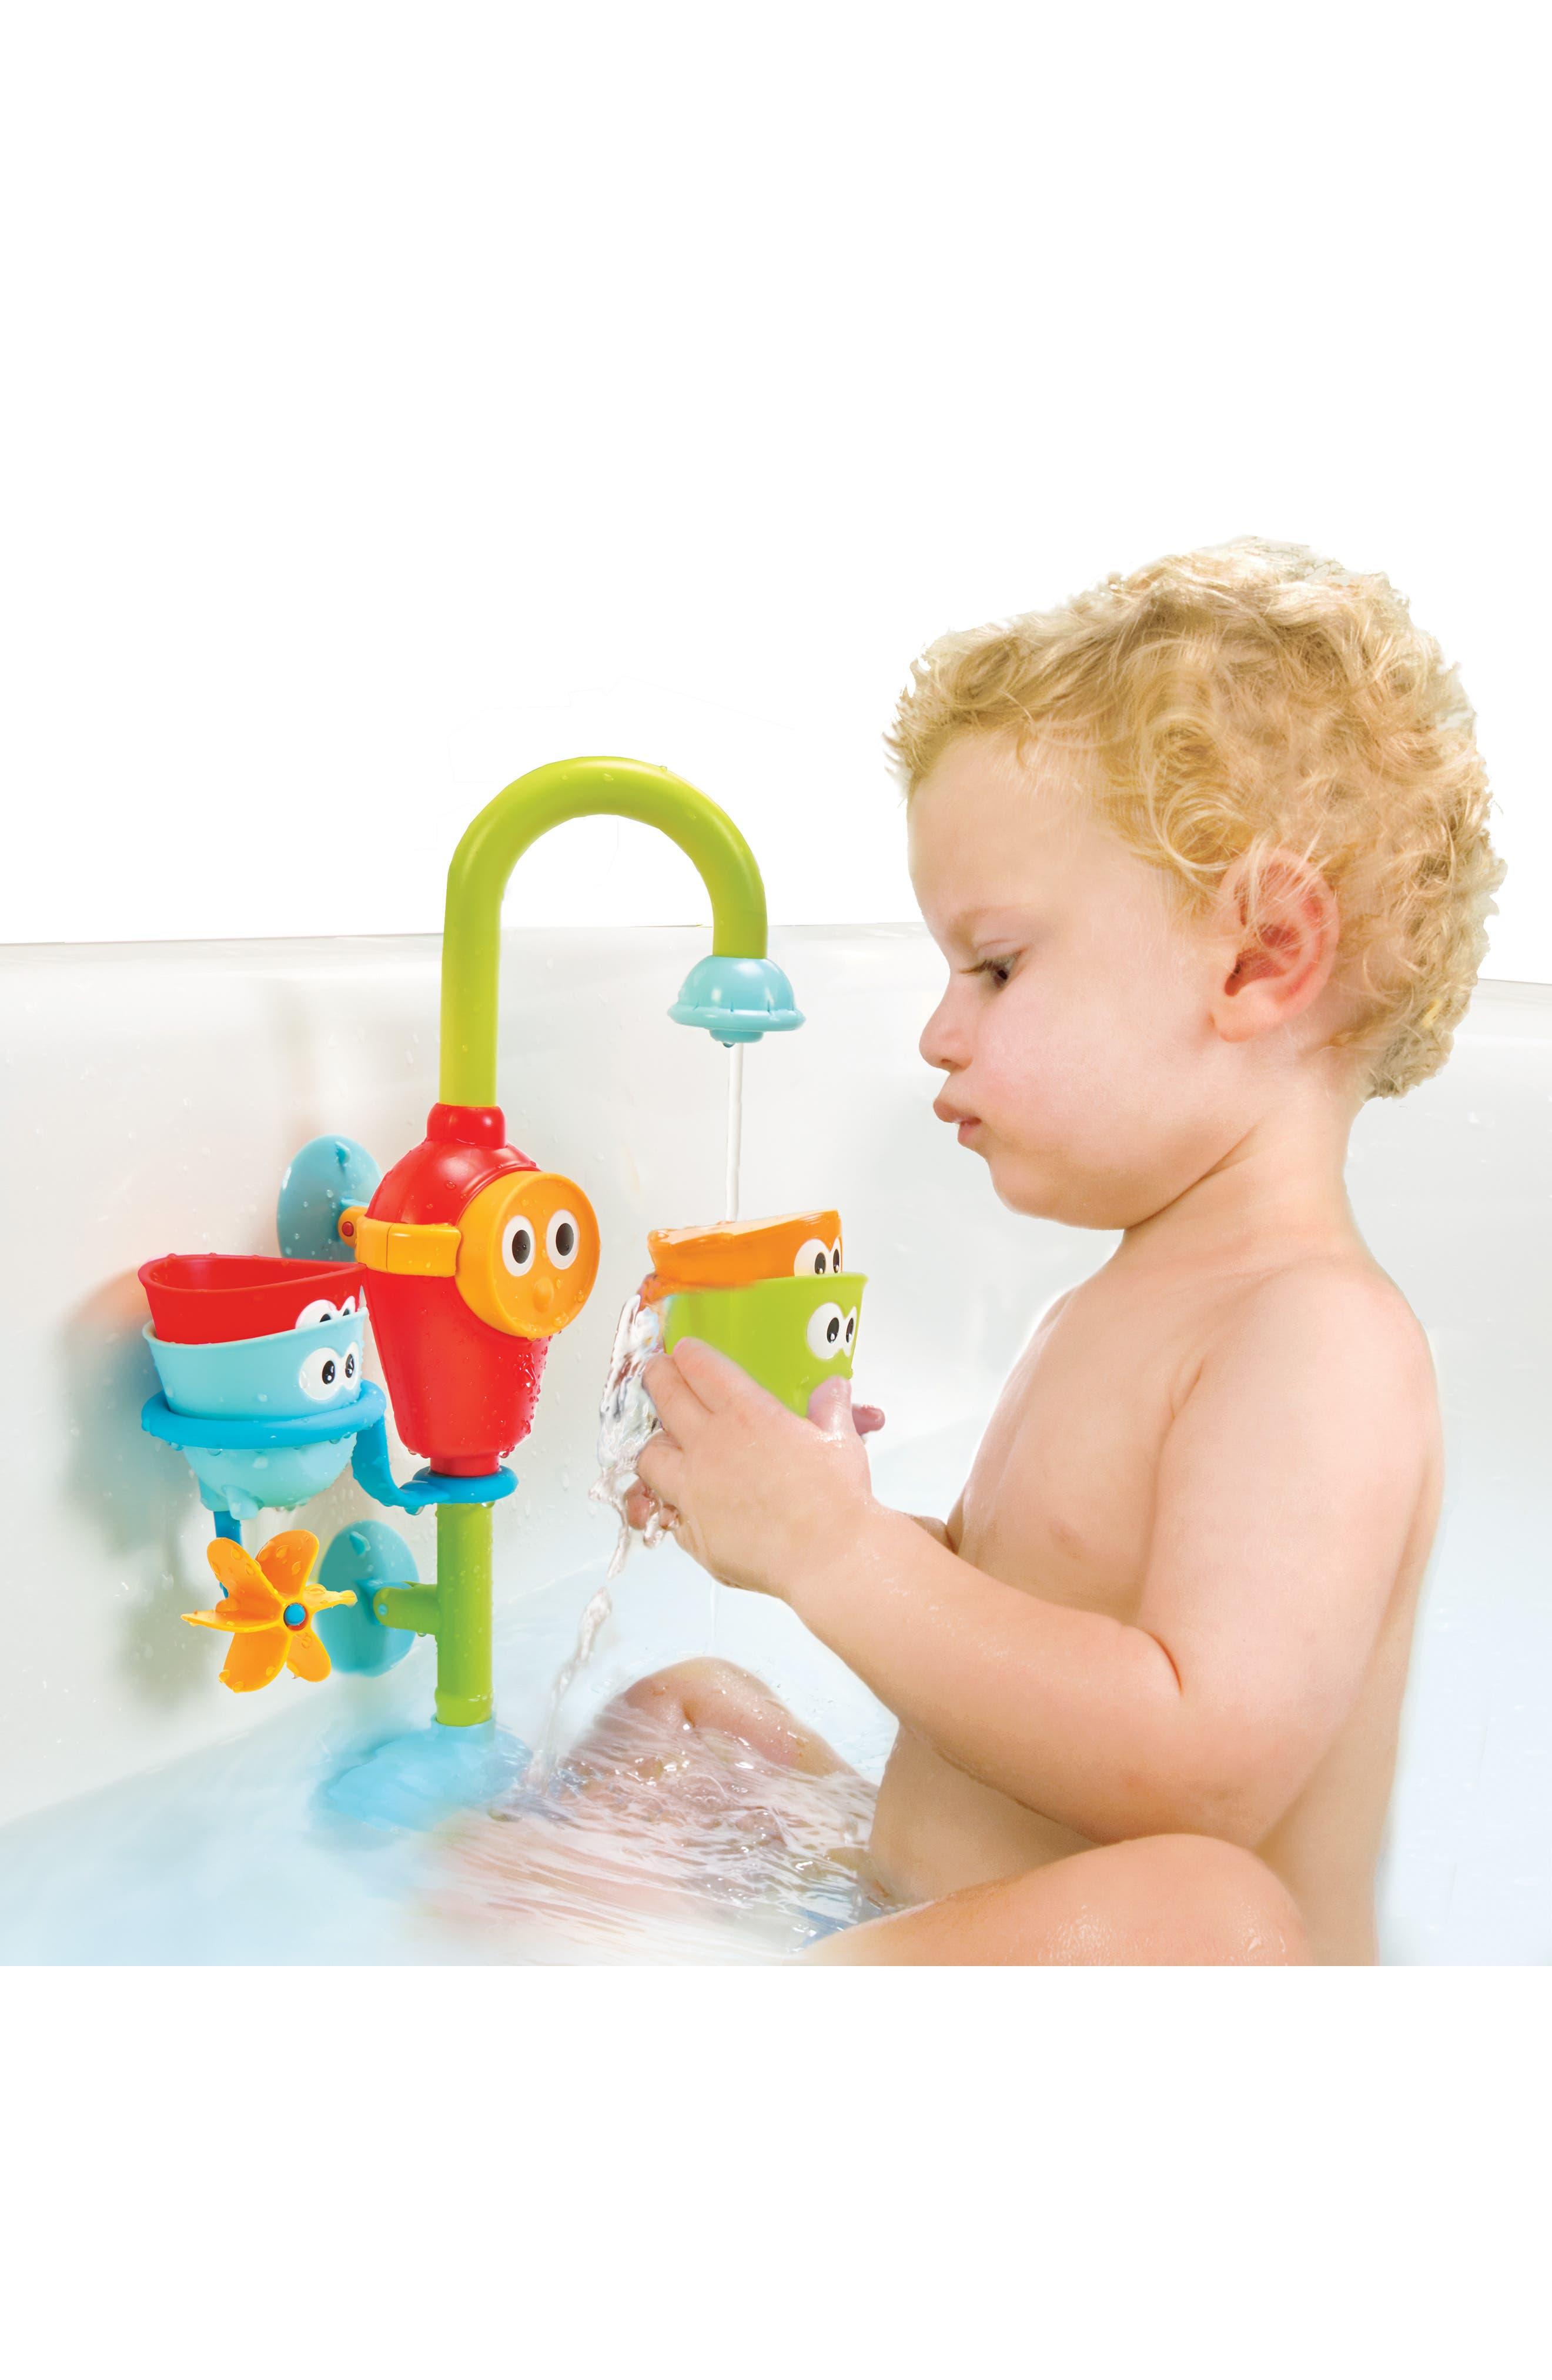 Flow 'N' Fill Spout Bath Toy,                             Alternate thumbnail 9, color,                             GREEN